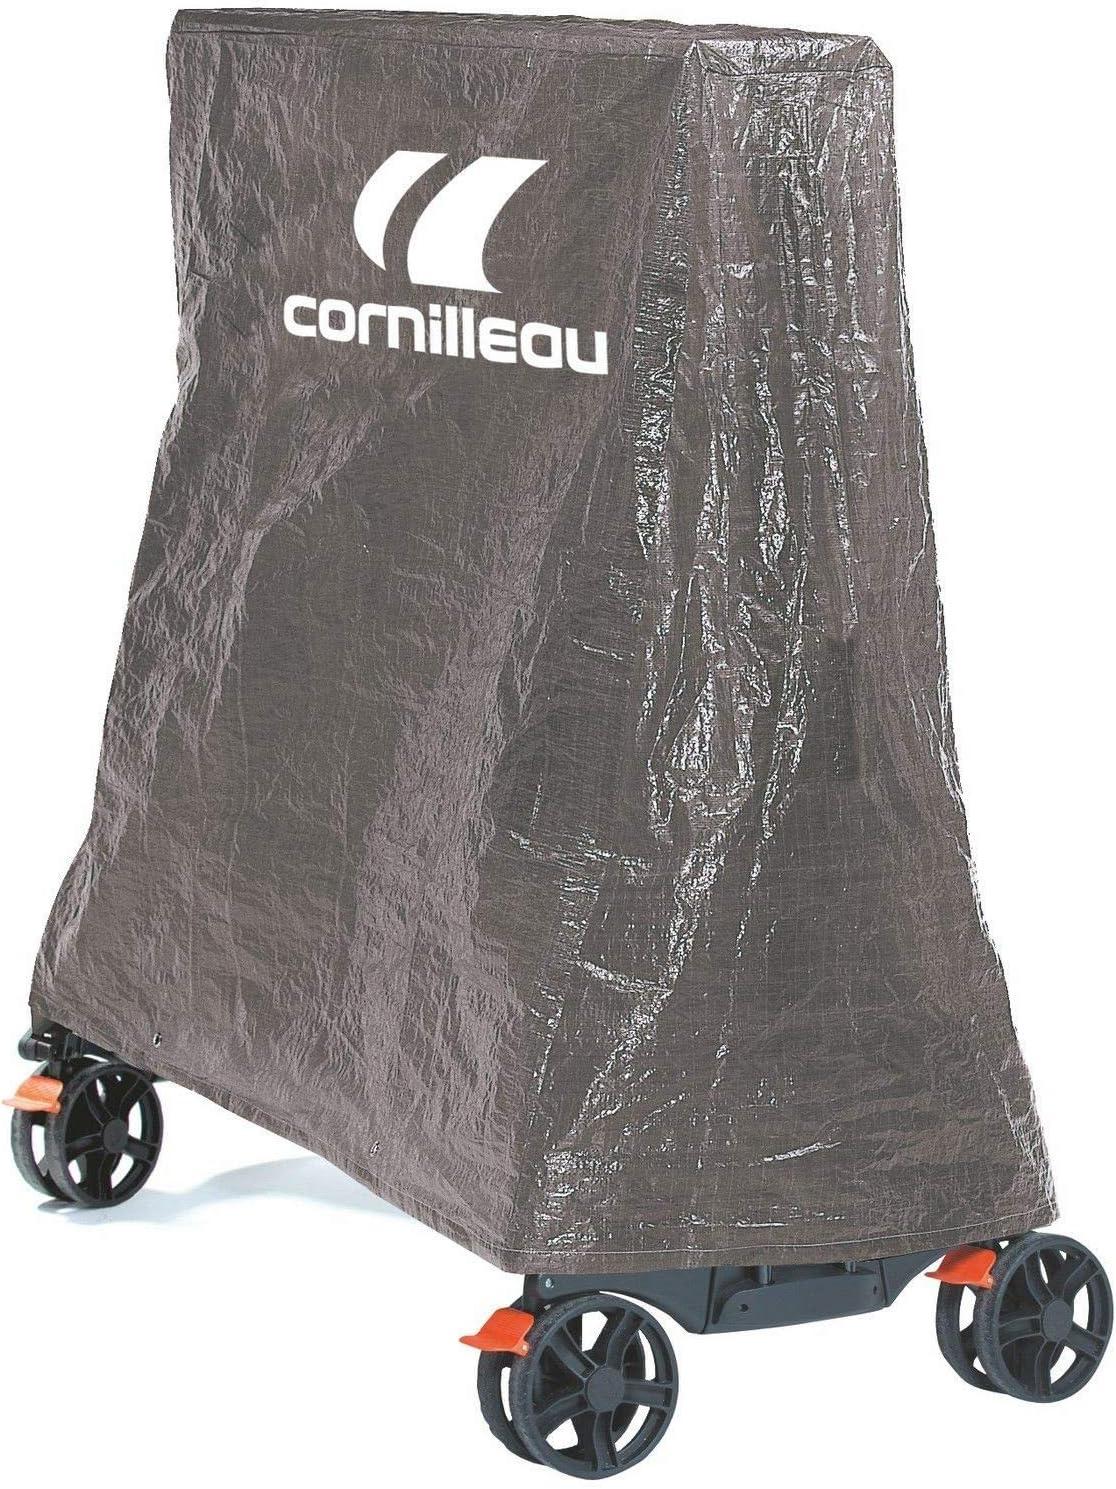 Cornilleau Sport PVC, Funda para mesa, colorgris